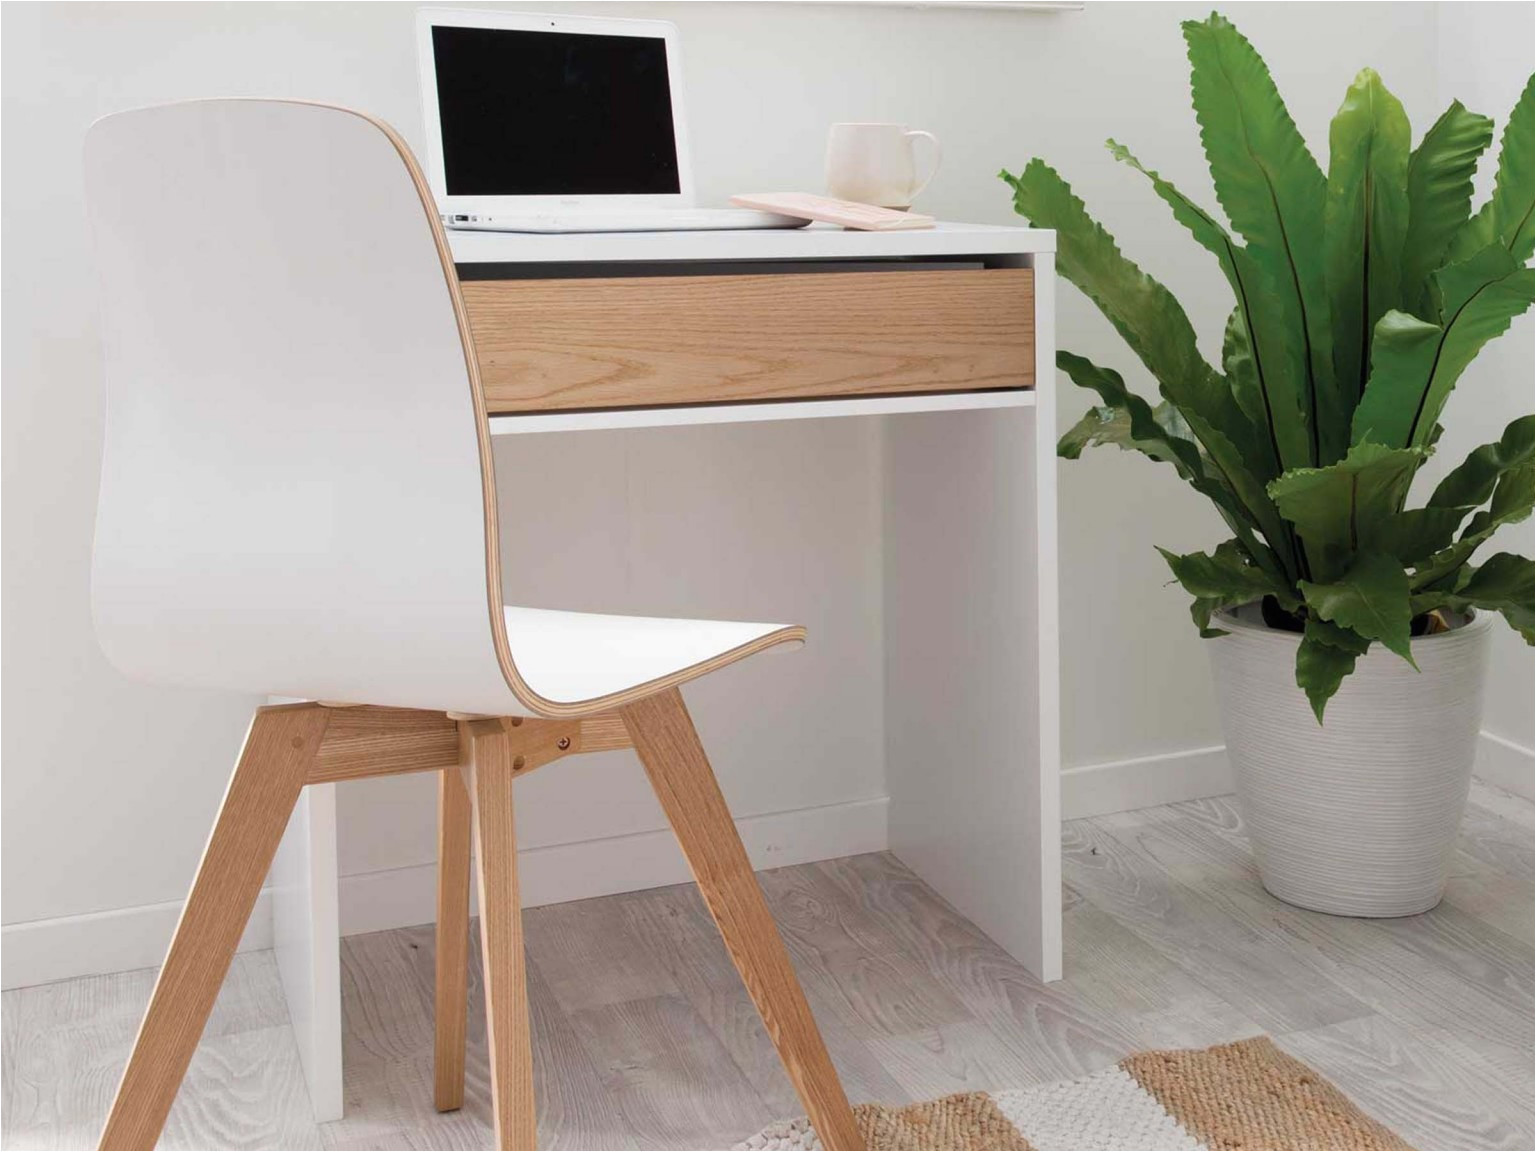 jordi desk white natural